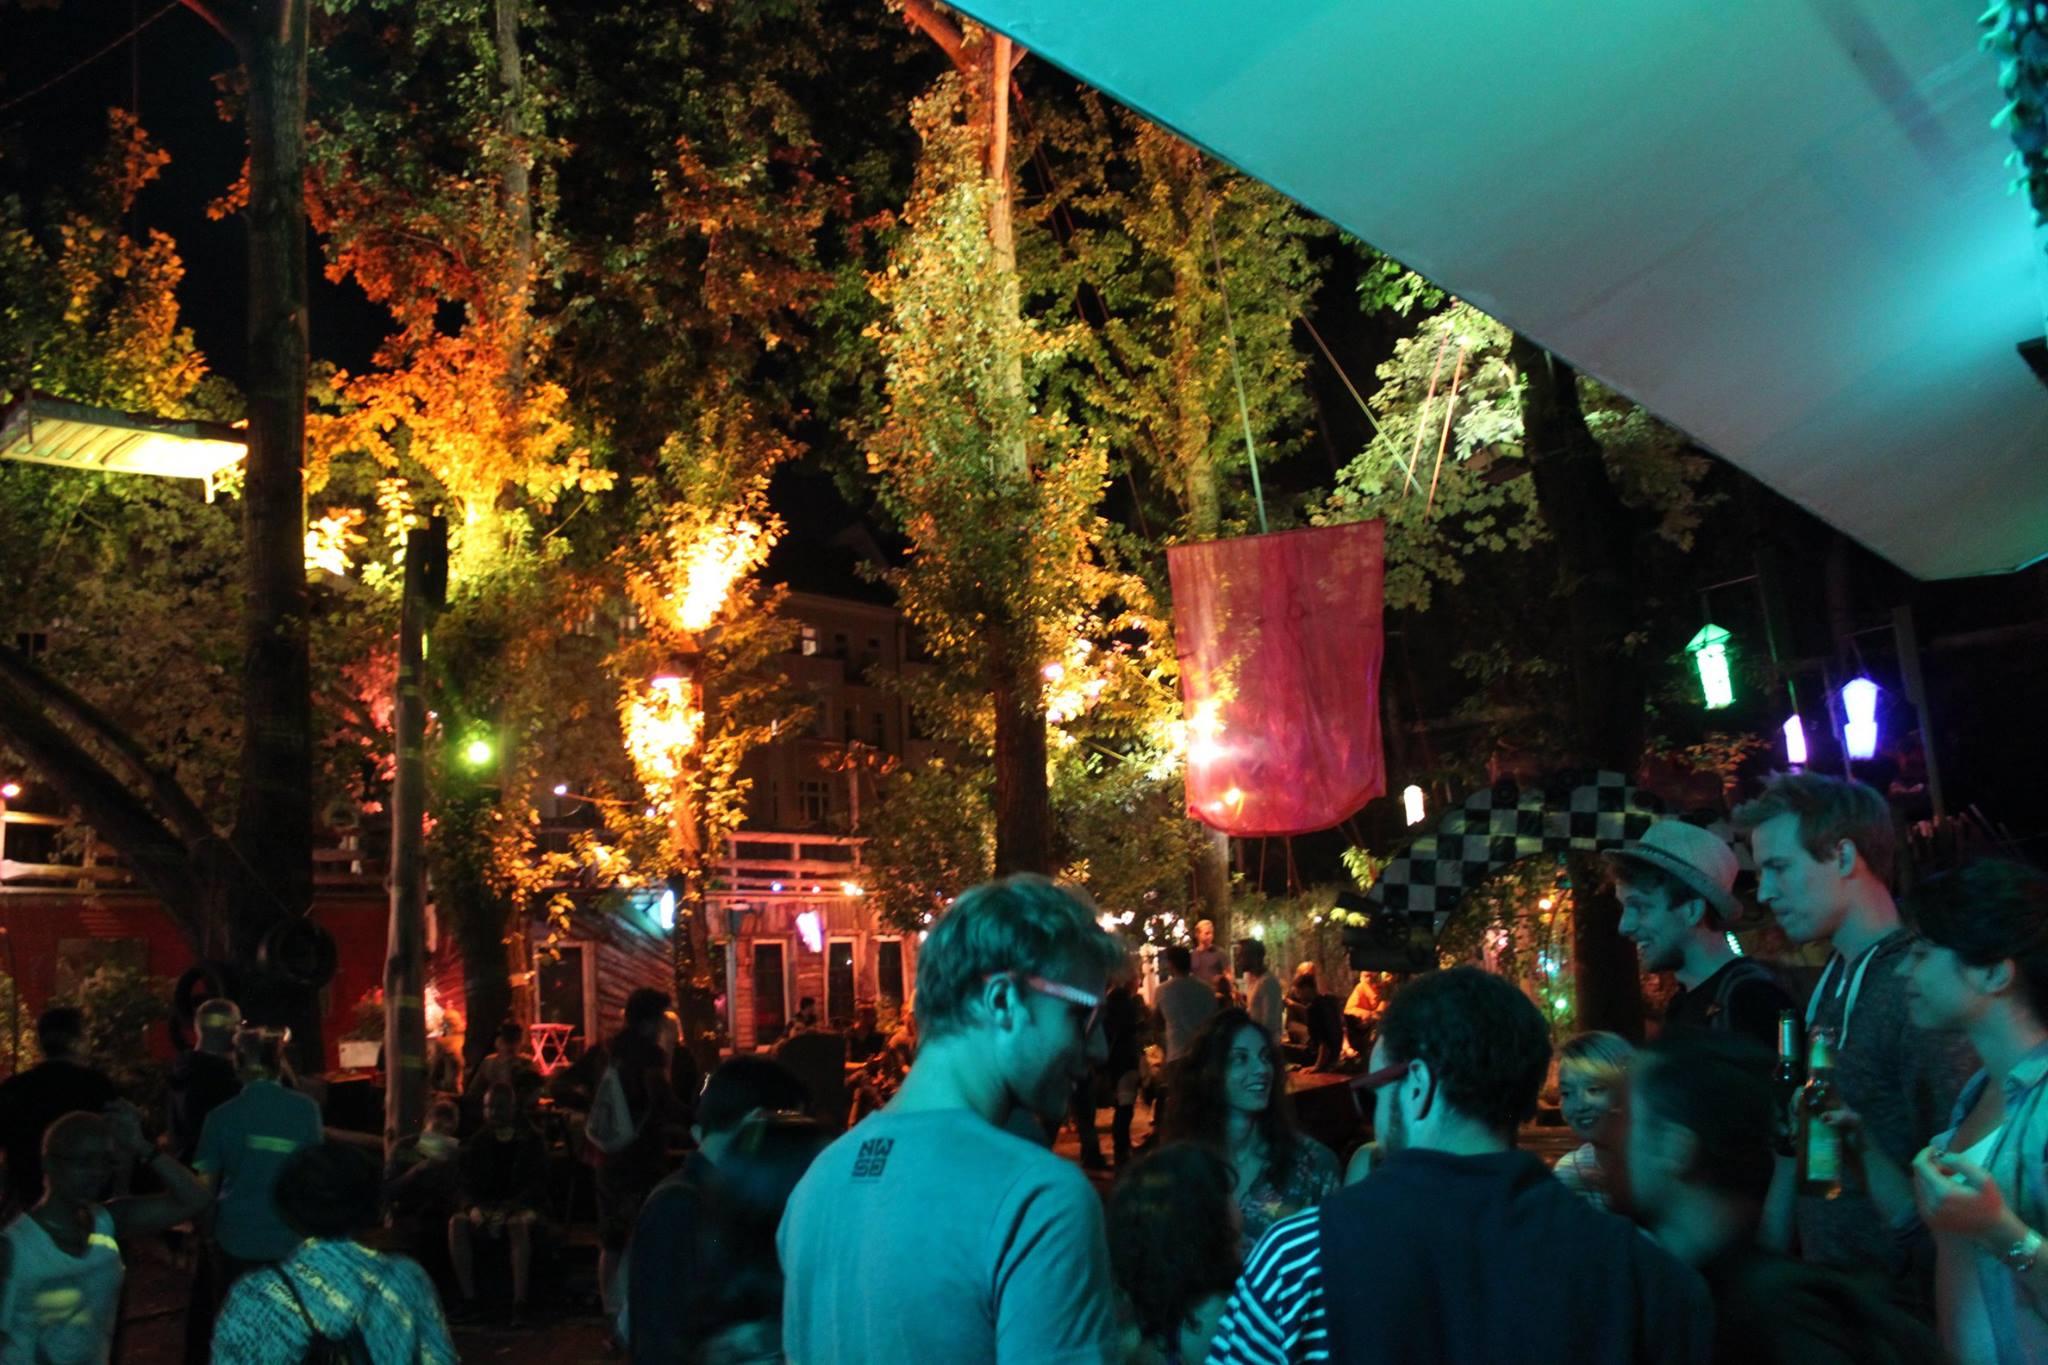 Wilde Renate: Electro/Techno/House Clubs in Berlin Friedrichshain